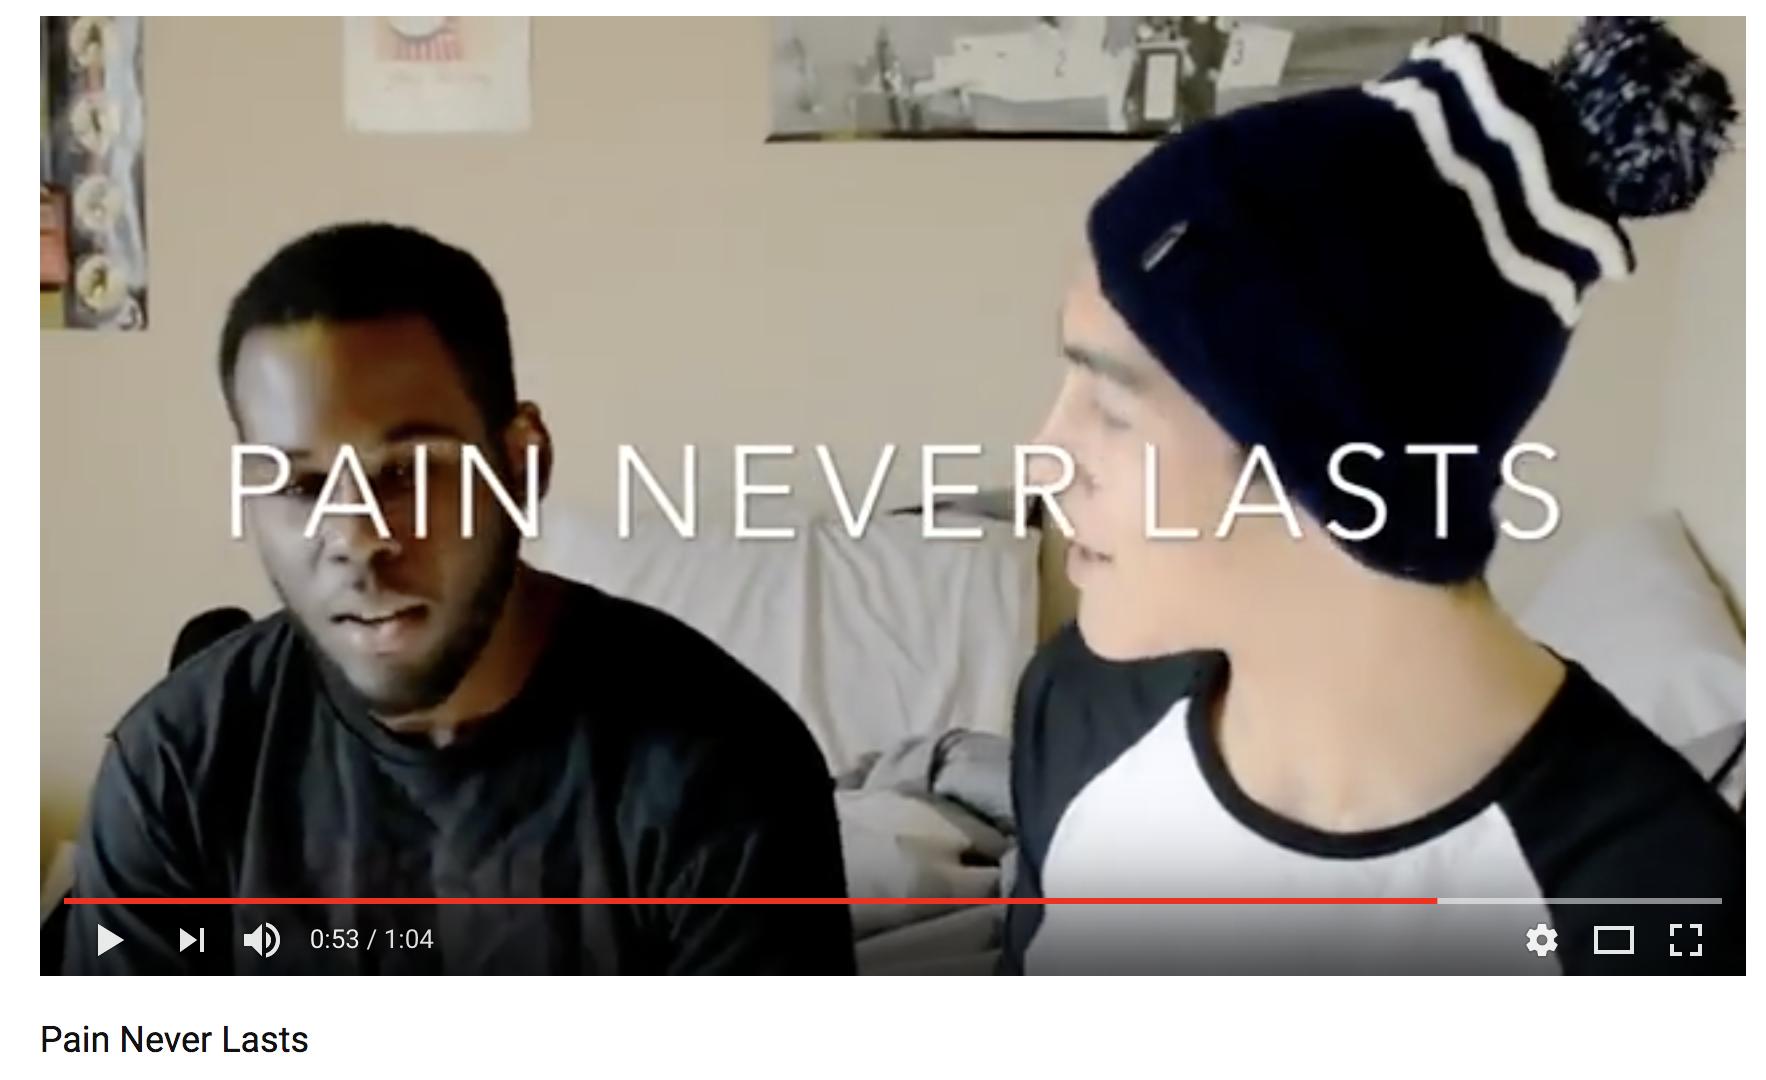 Pain Never Lasts screenshot.png